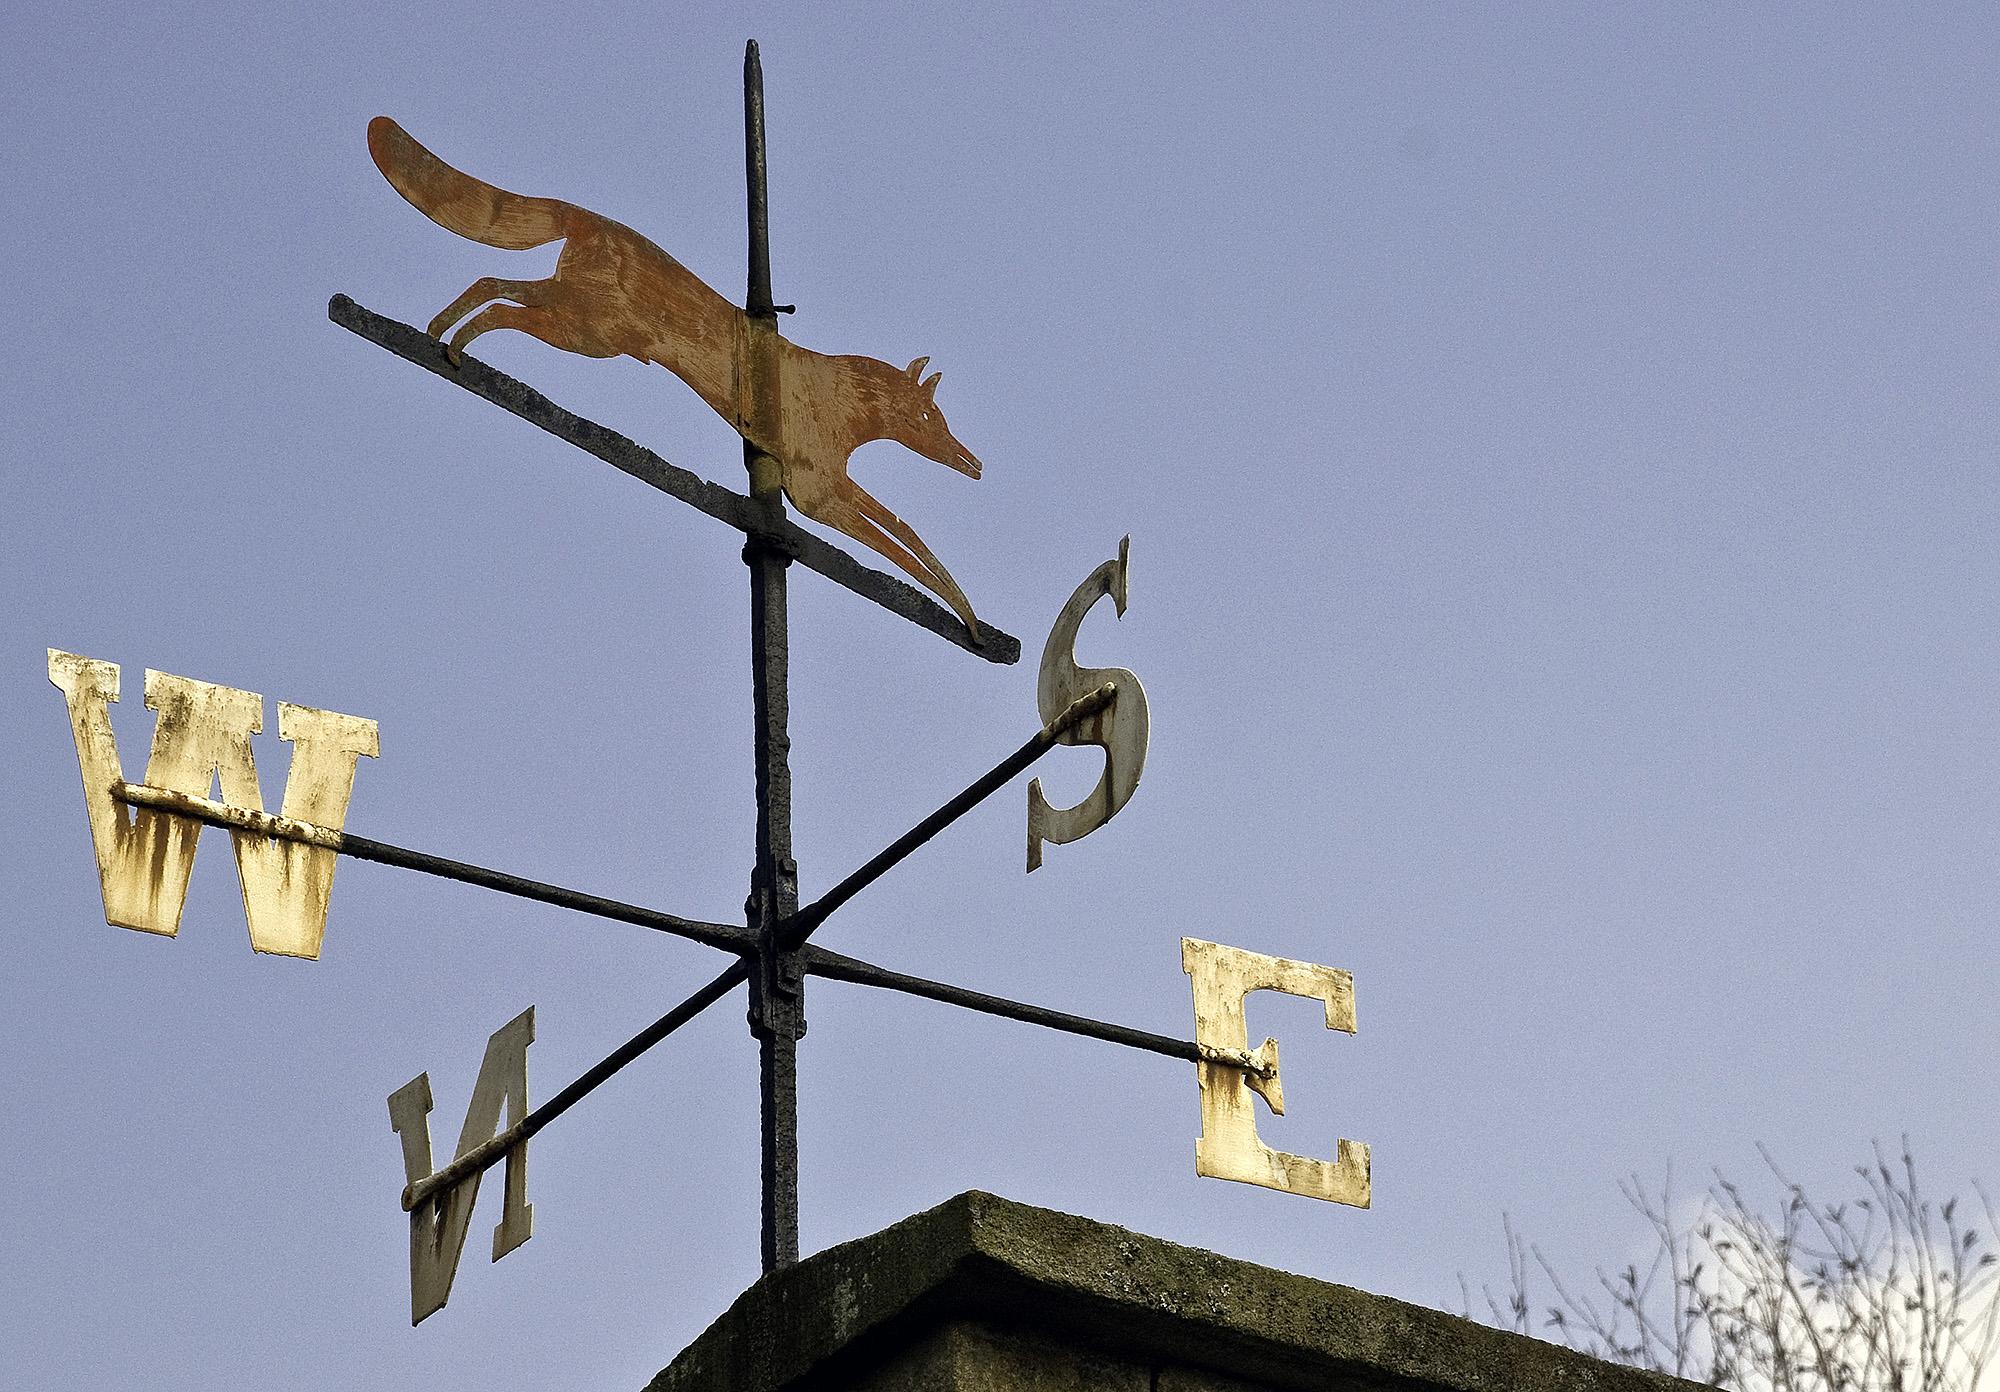 Red Fox on Weather Vane, County Durham